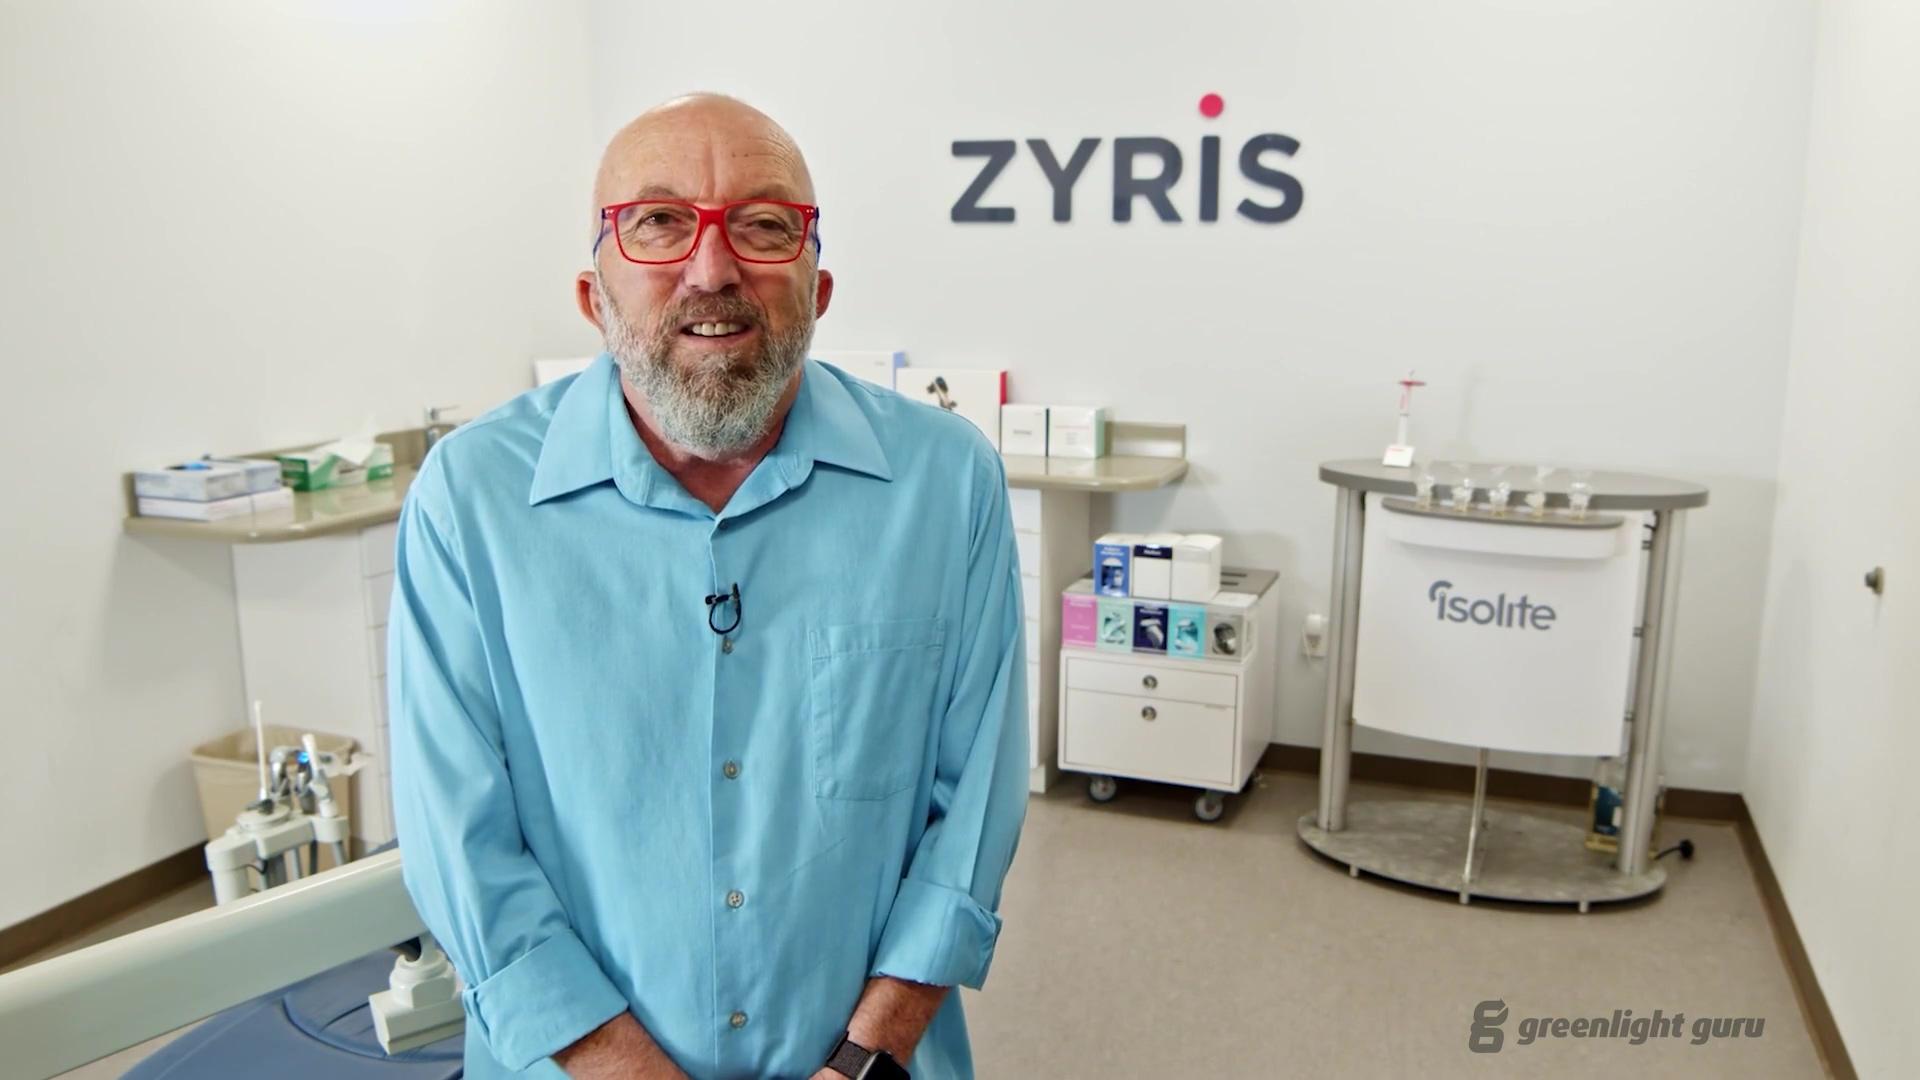 Zyris Case Study